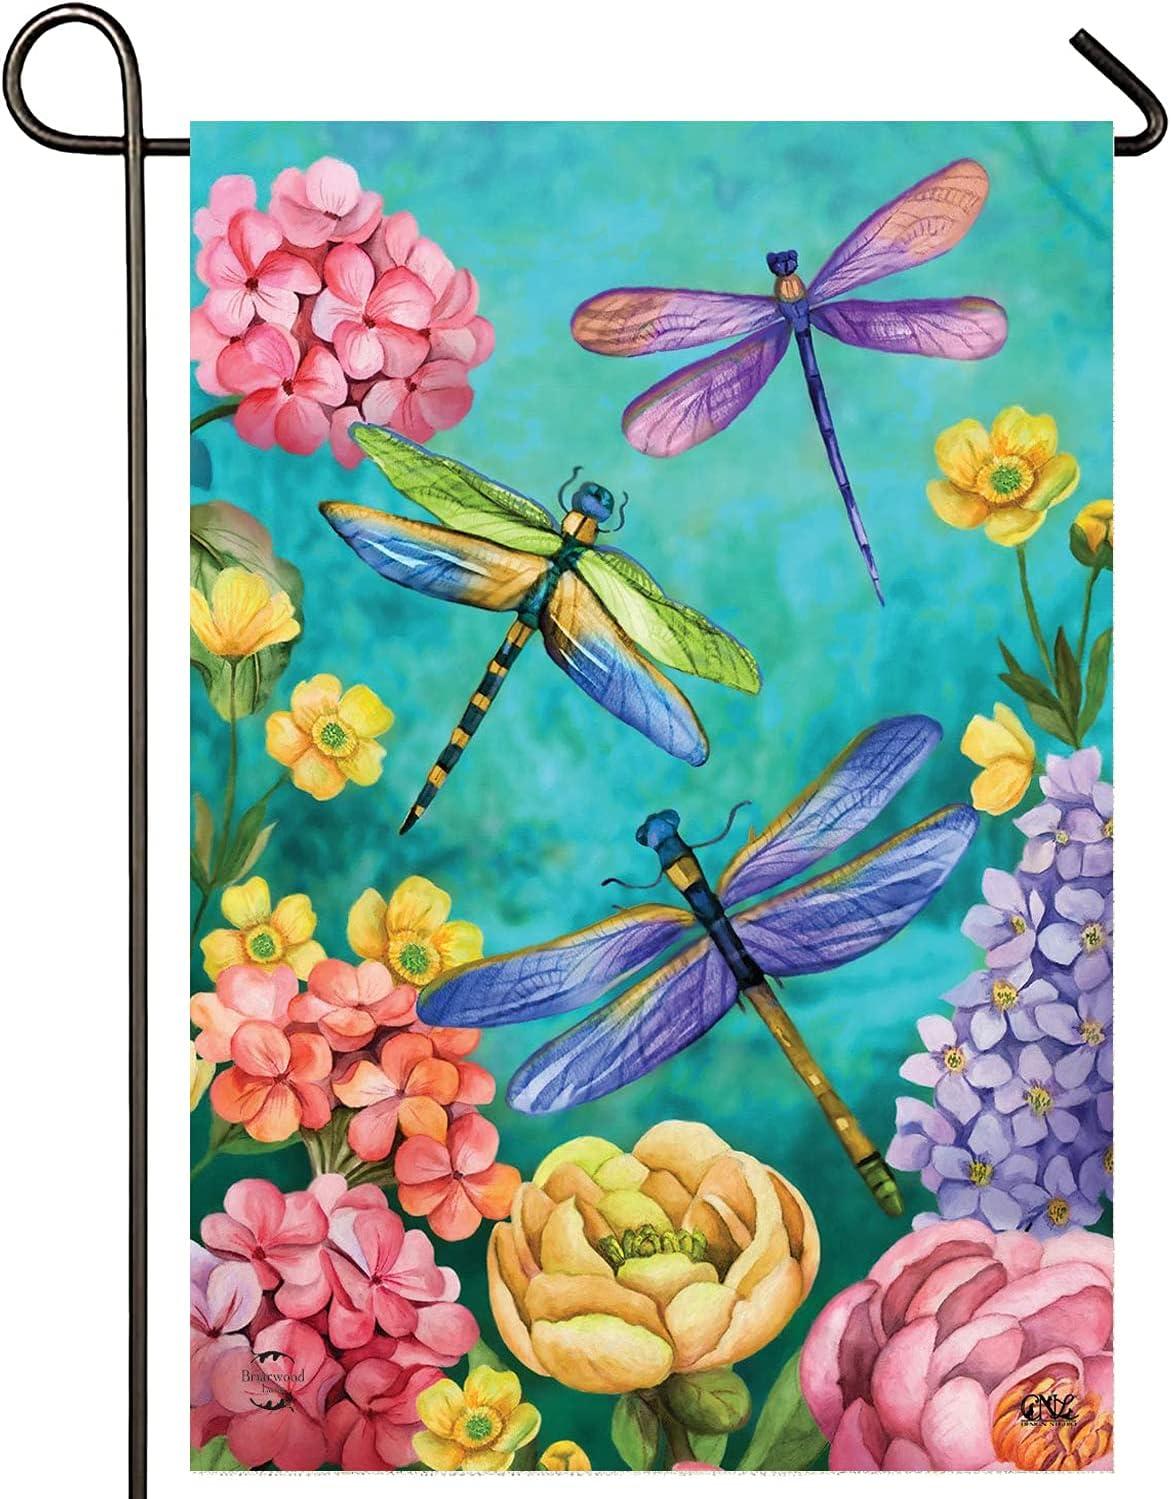 TAFFY'S Dragonfly Garden Flag for Summer-Summer Garden Flag for Outside 12x18-Double Sided Yard Flag-Summer Garden Decorations-Waterproof